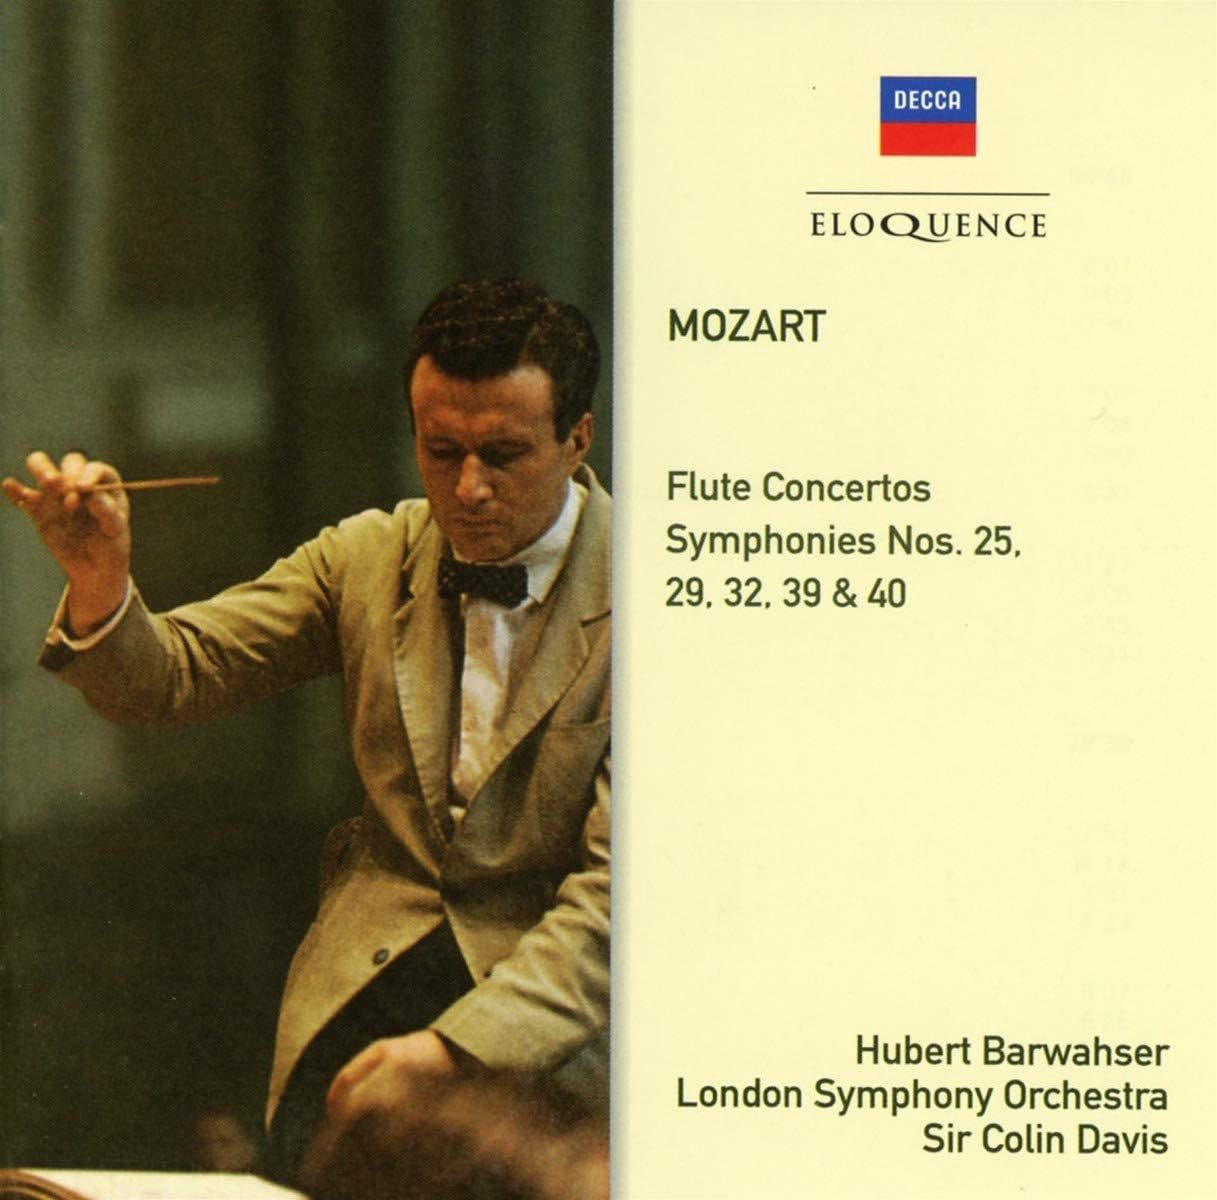 Photo No.1 of Mozart: Flute Concertos, Symphonies 39, 40, 25, 29, 32